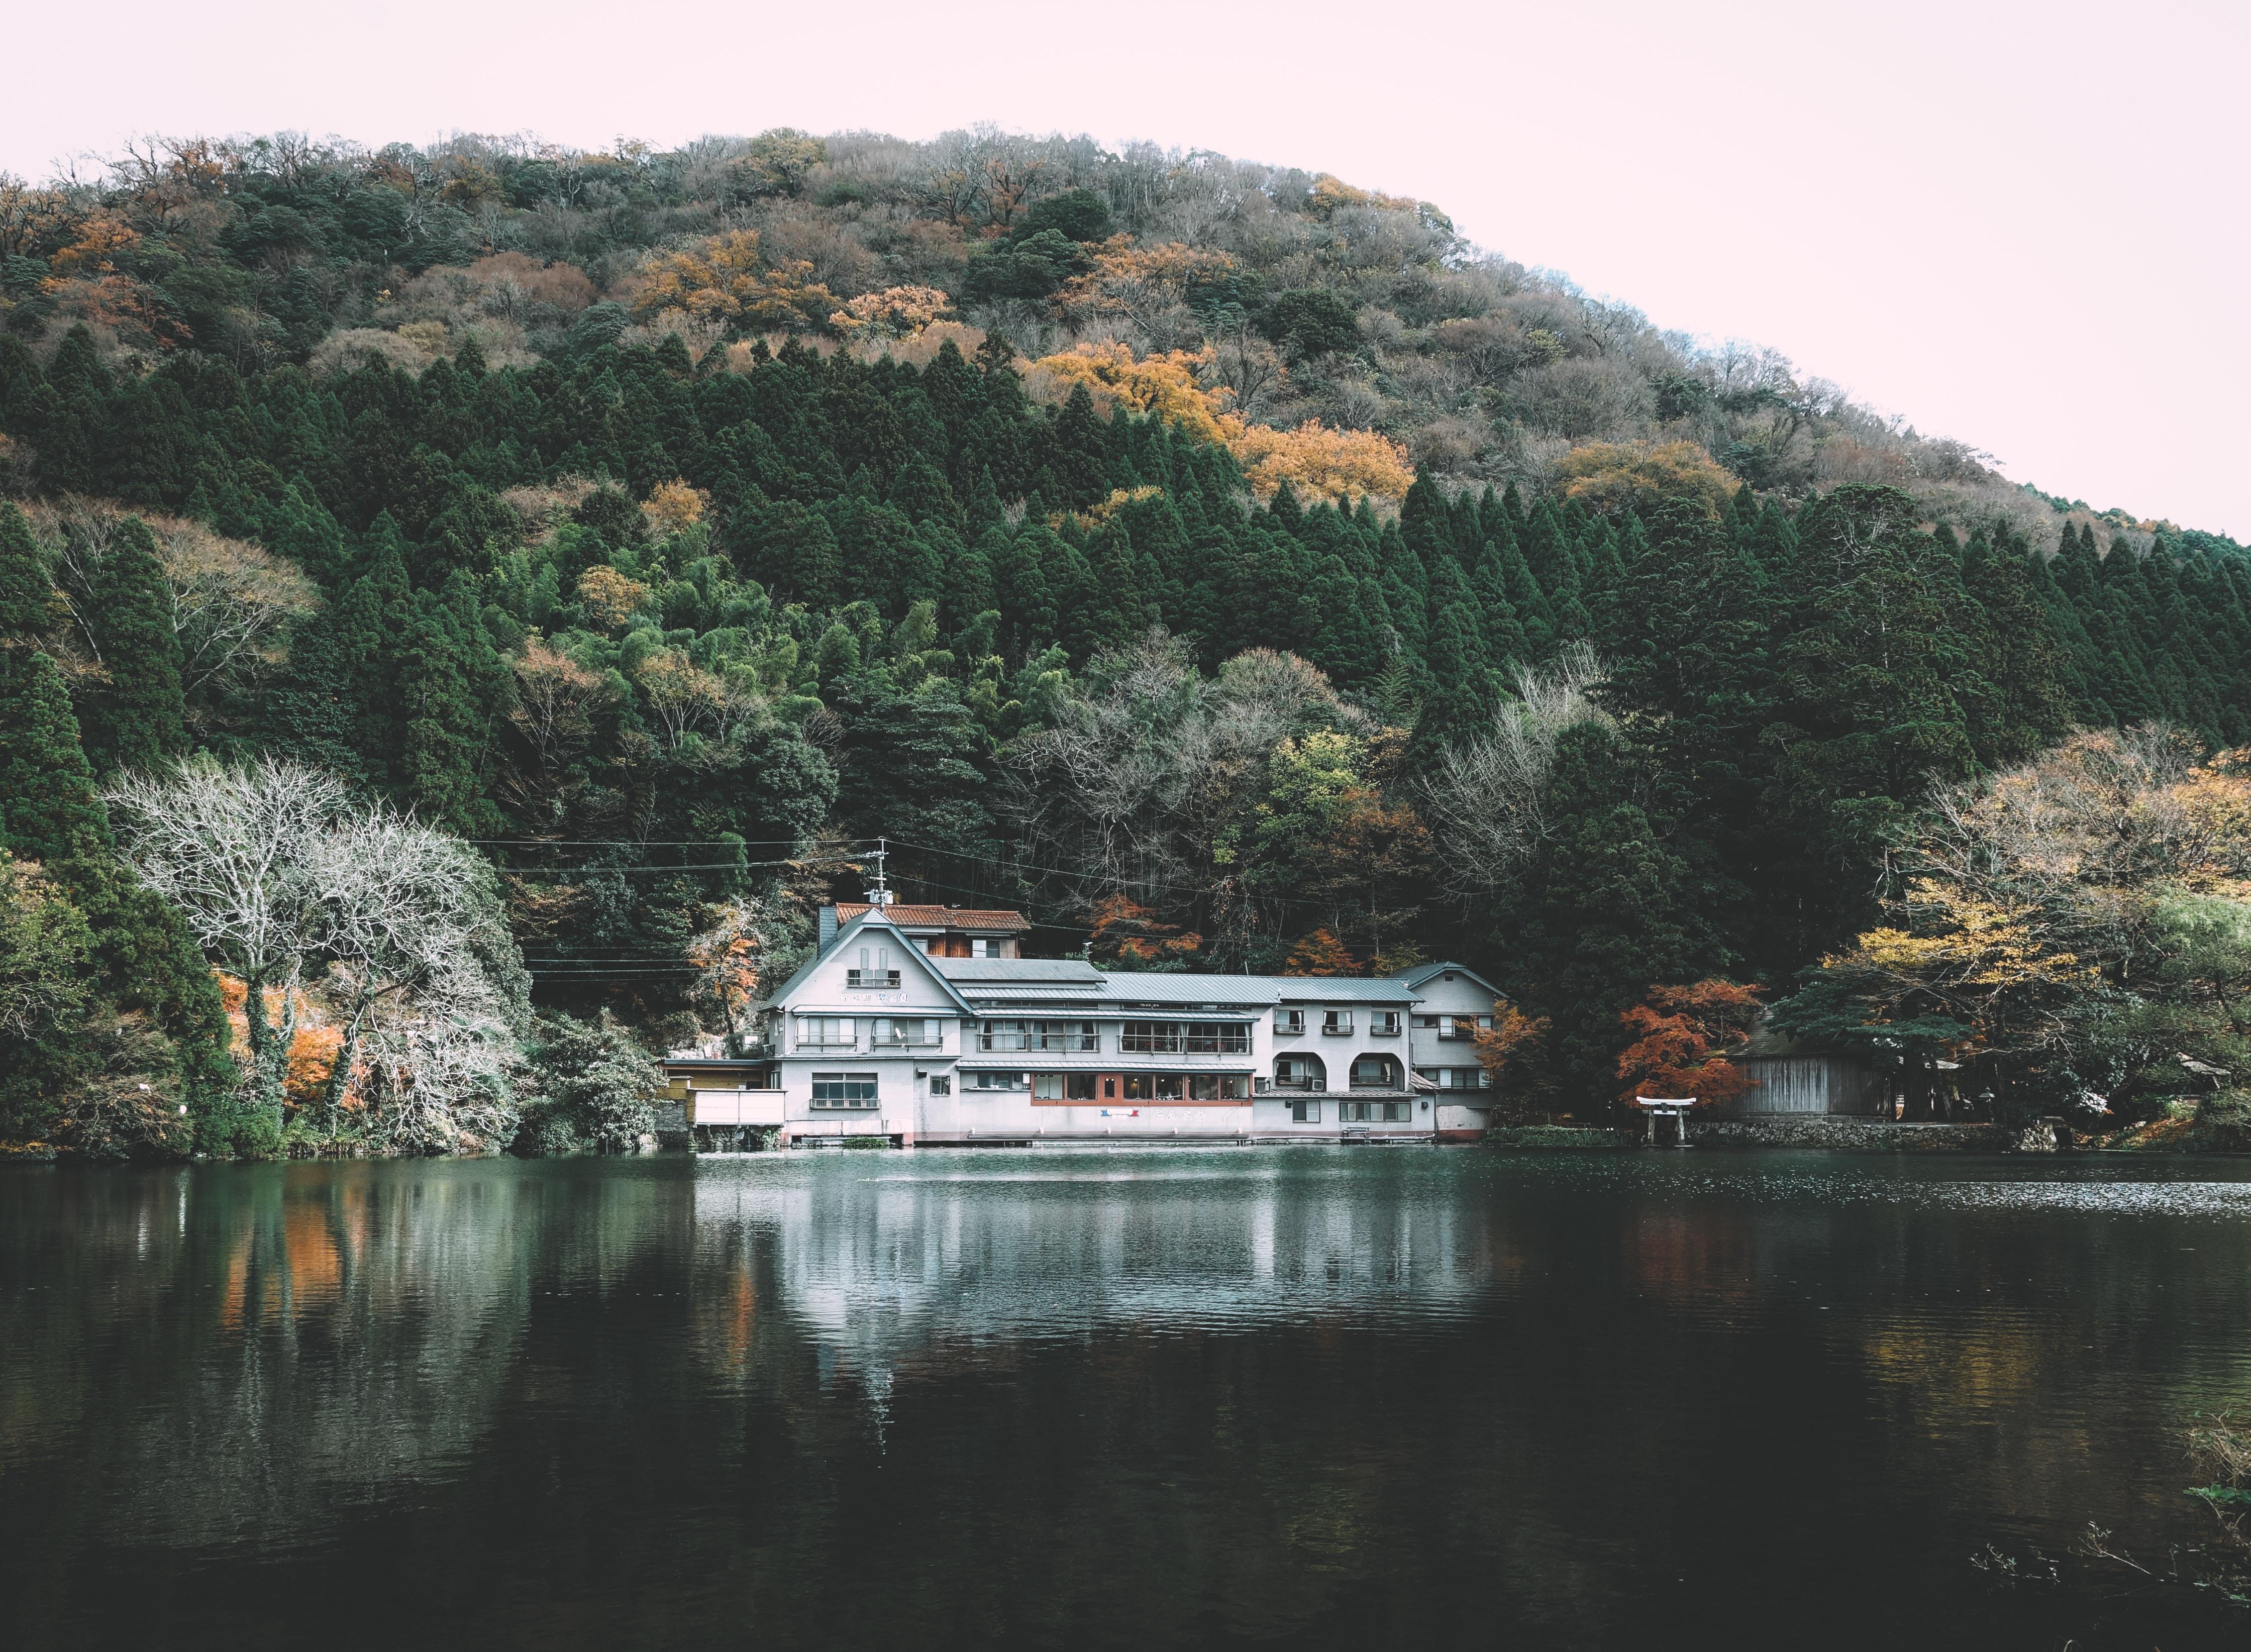 house beside body of water